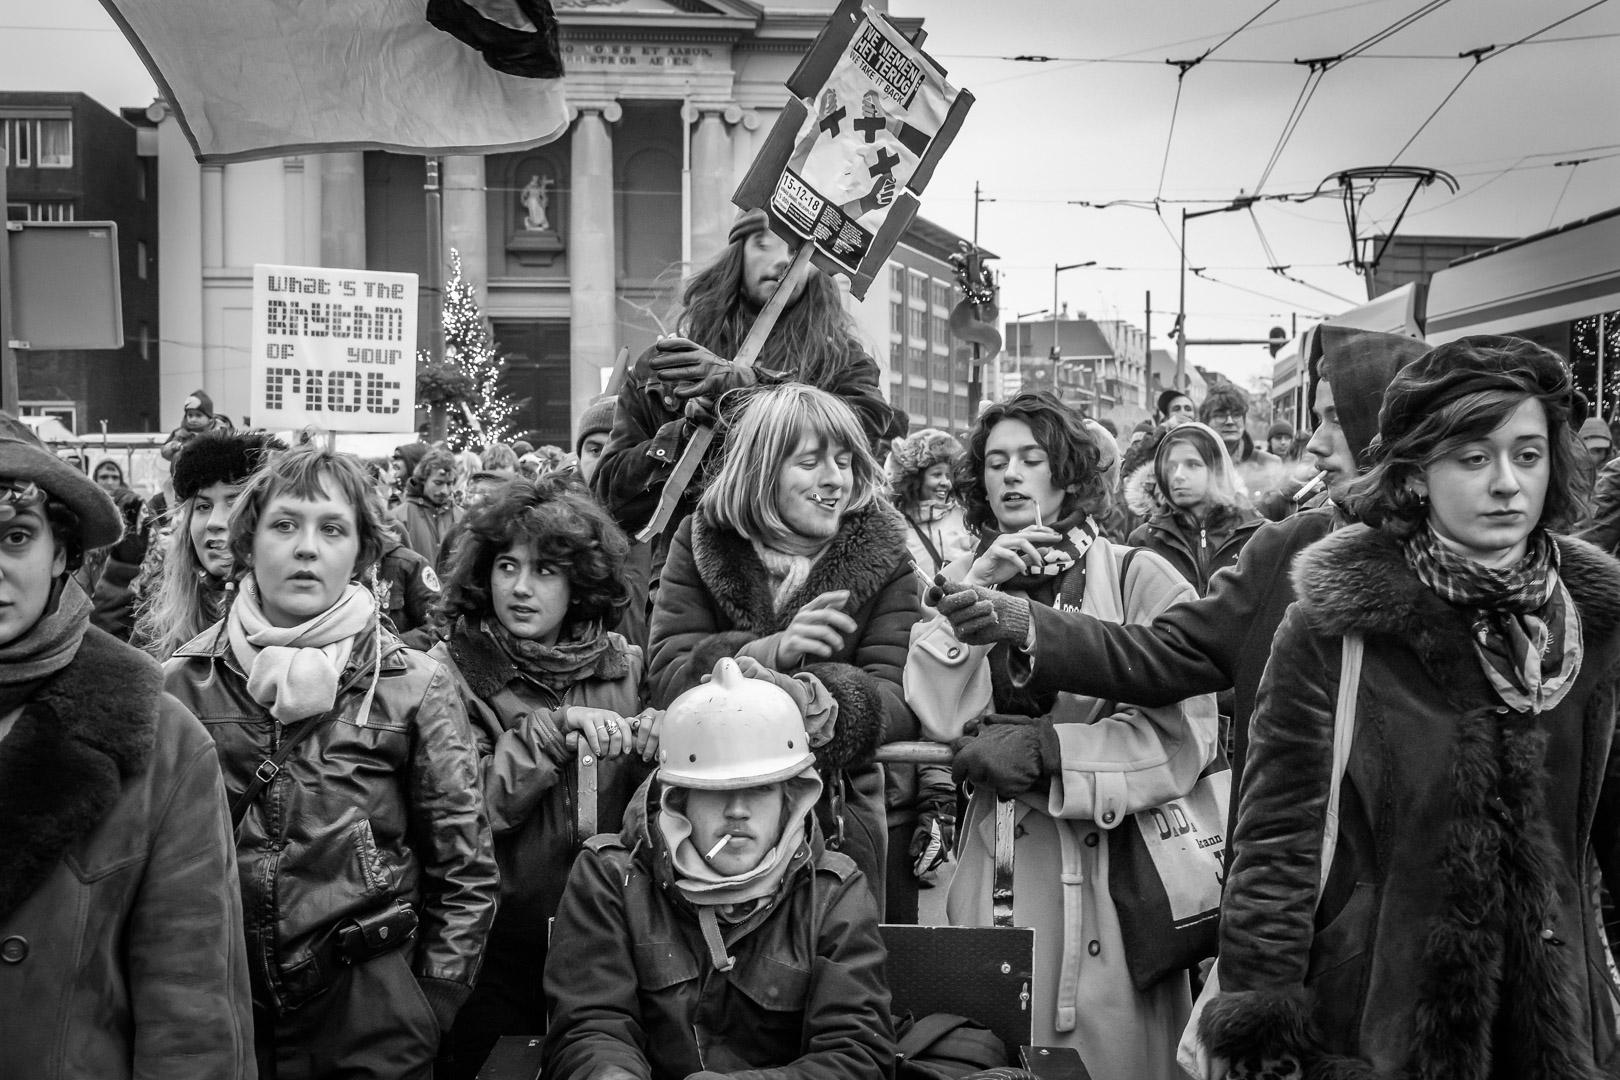 Demonstration cultural Center ADM 2018, Amsterdam